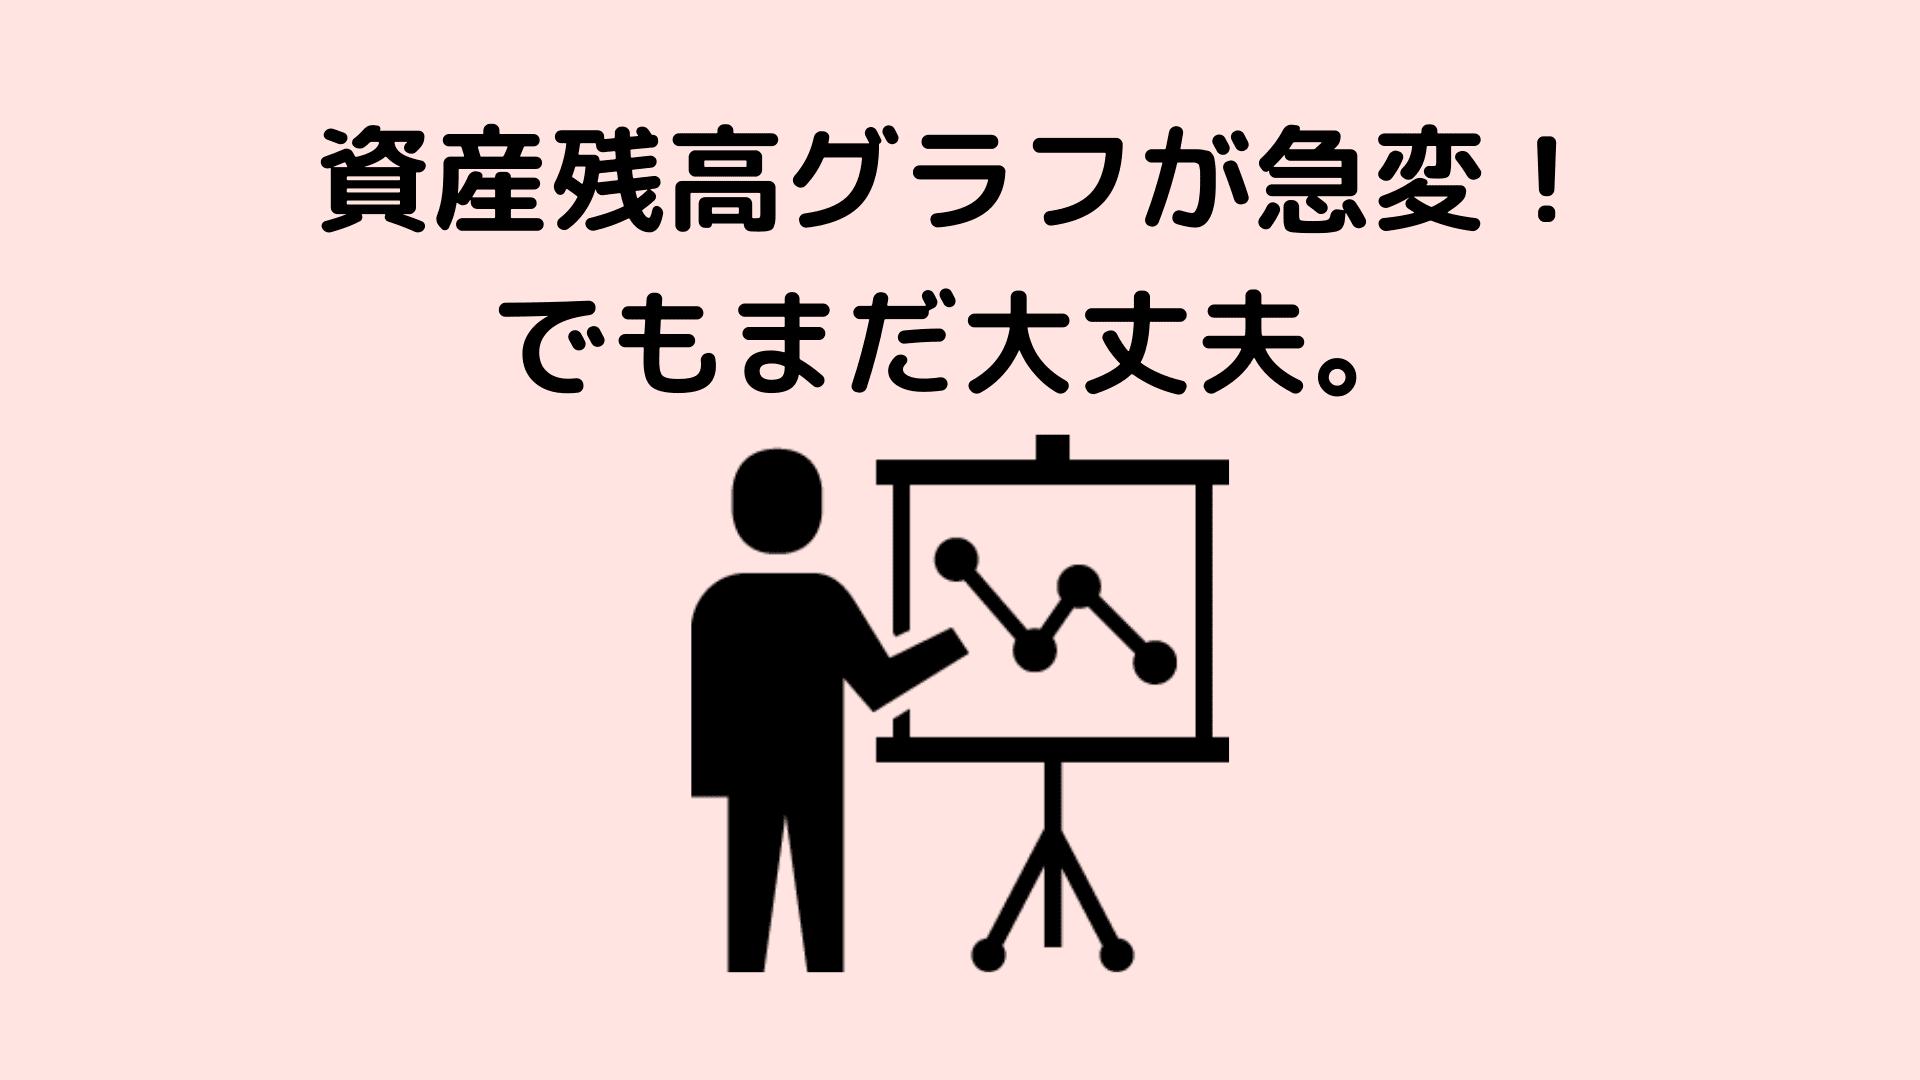 Shisanzandaka graph